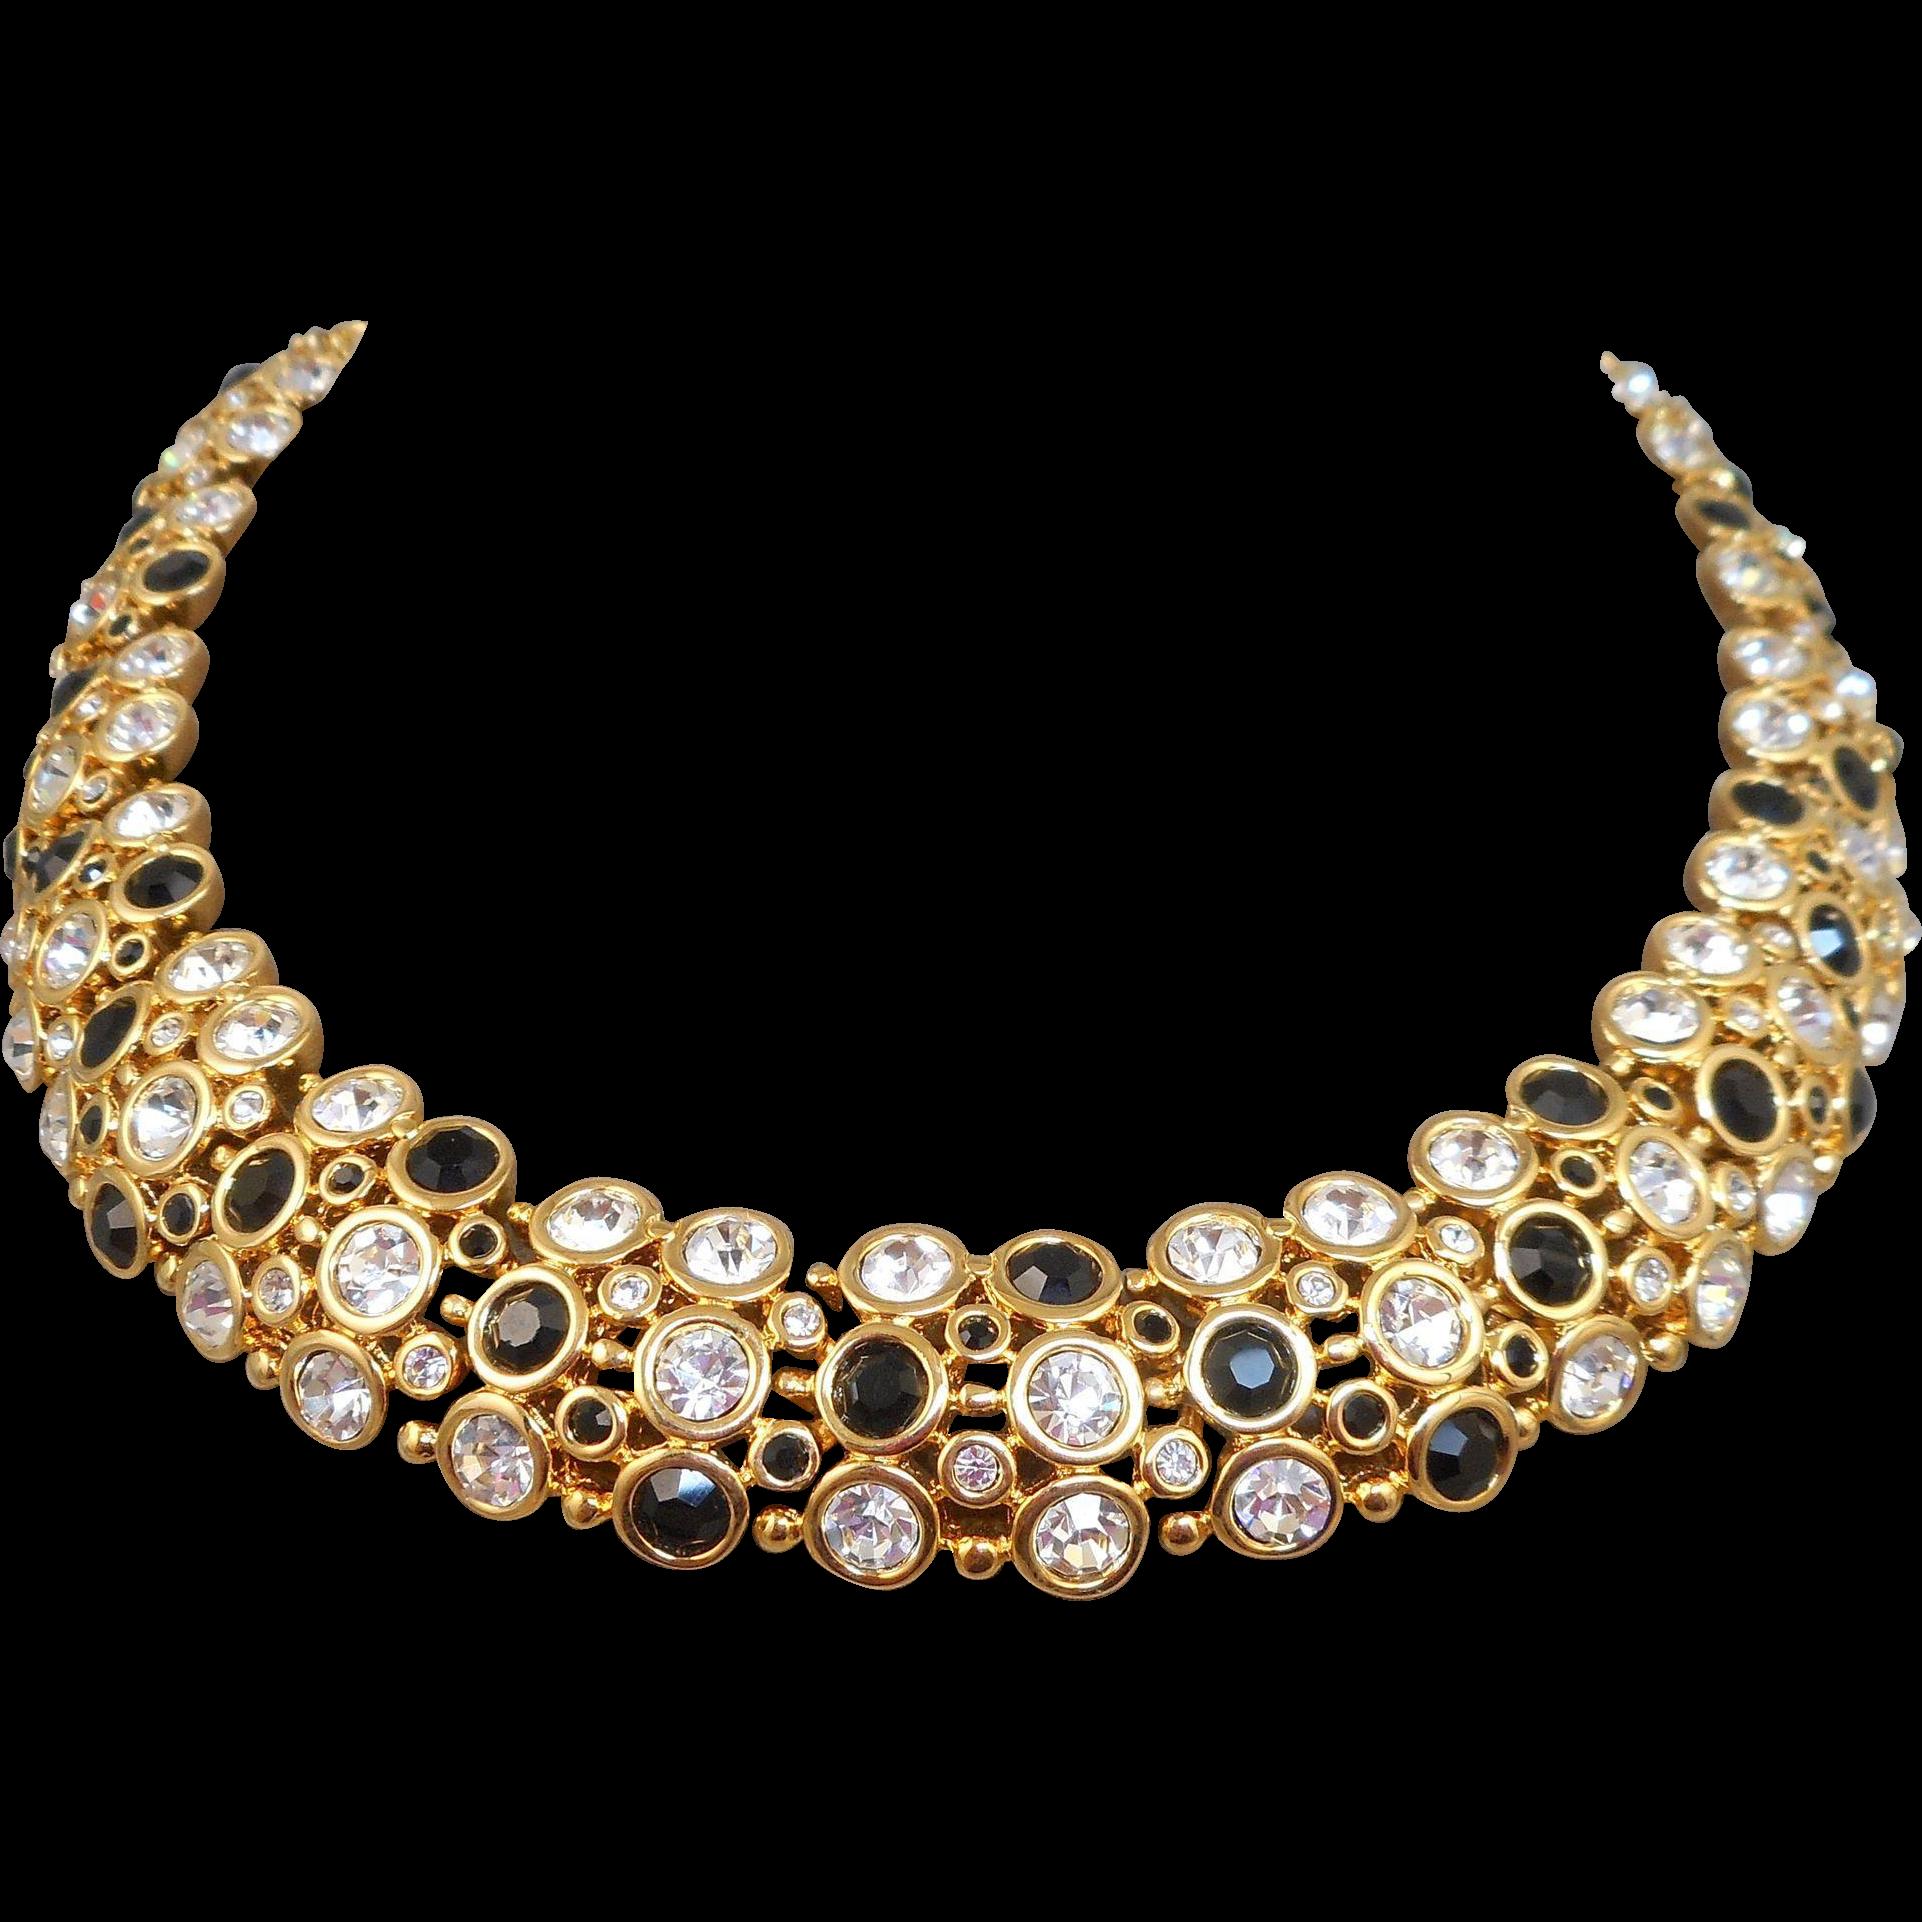 Swarovski Choker Necklace From Antiqueali On Ruby Lane